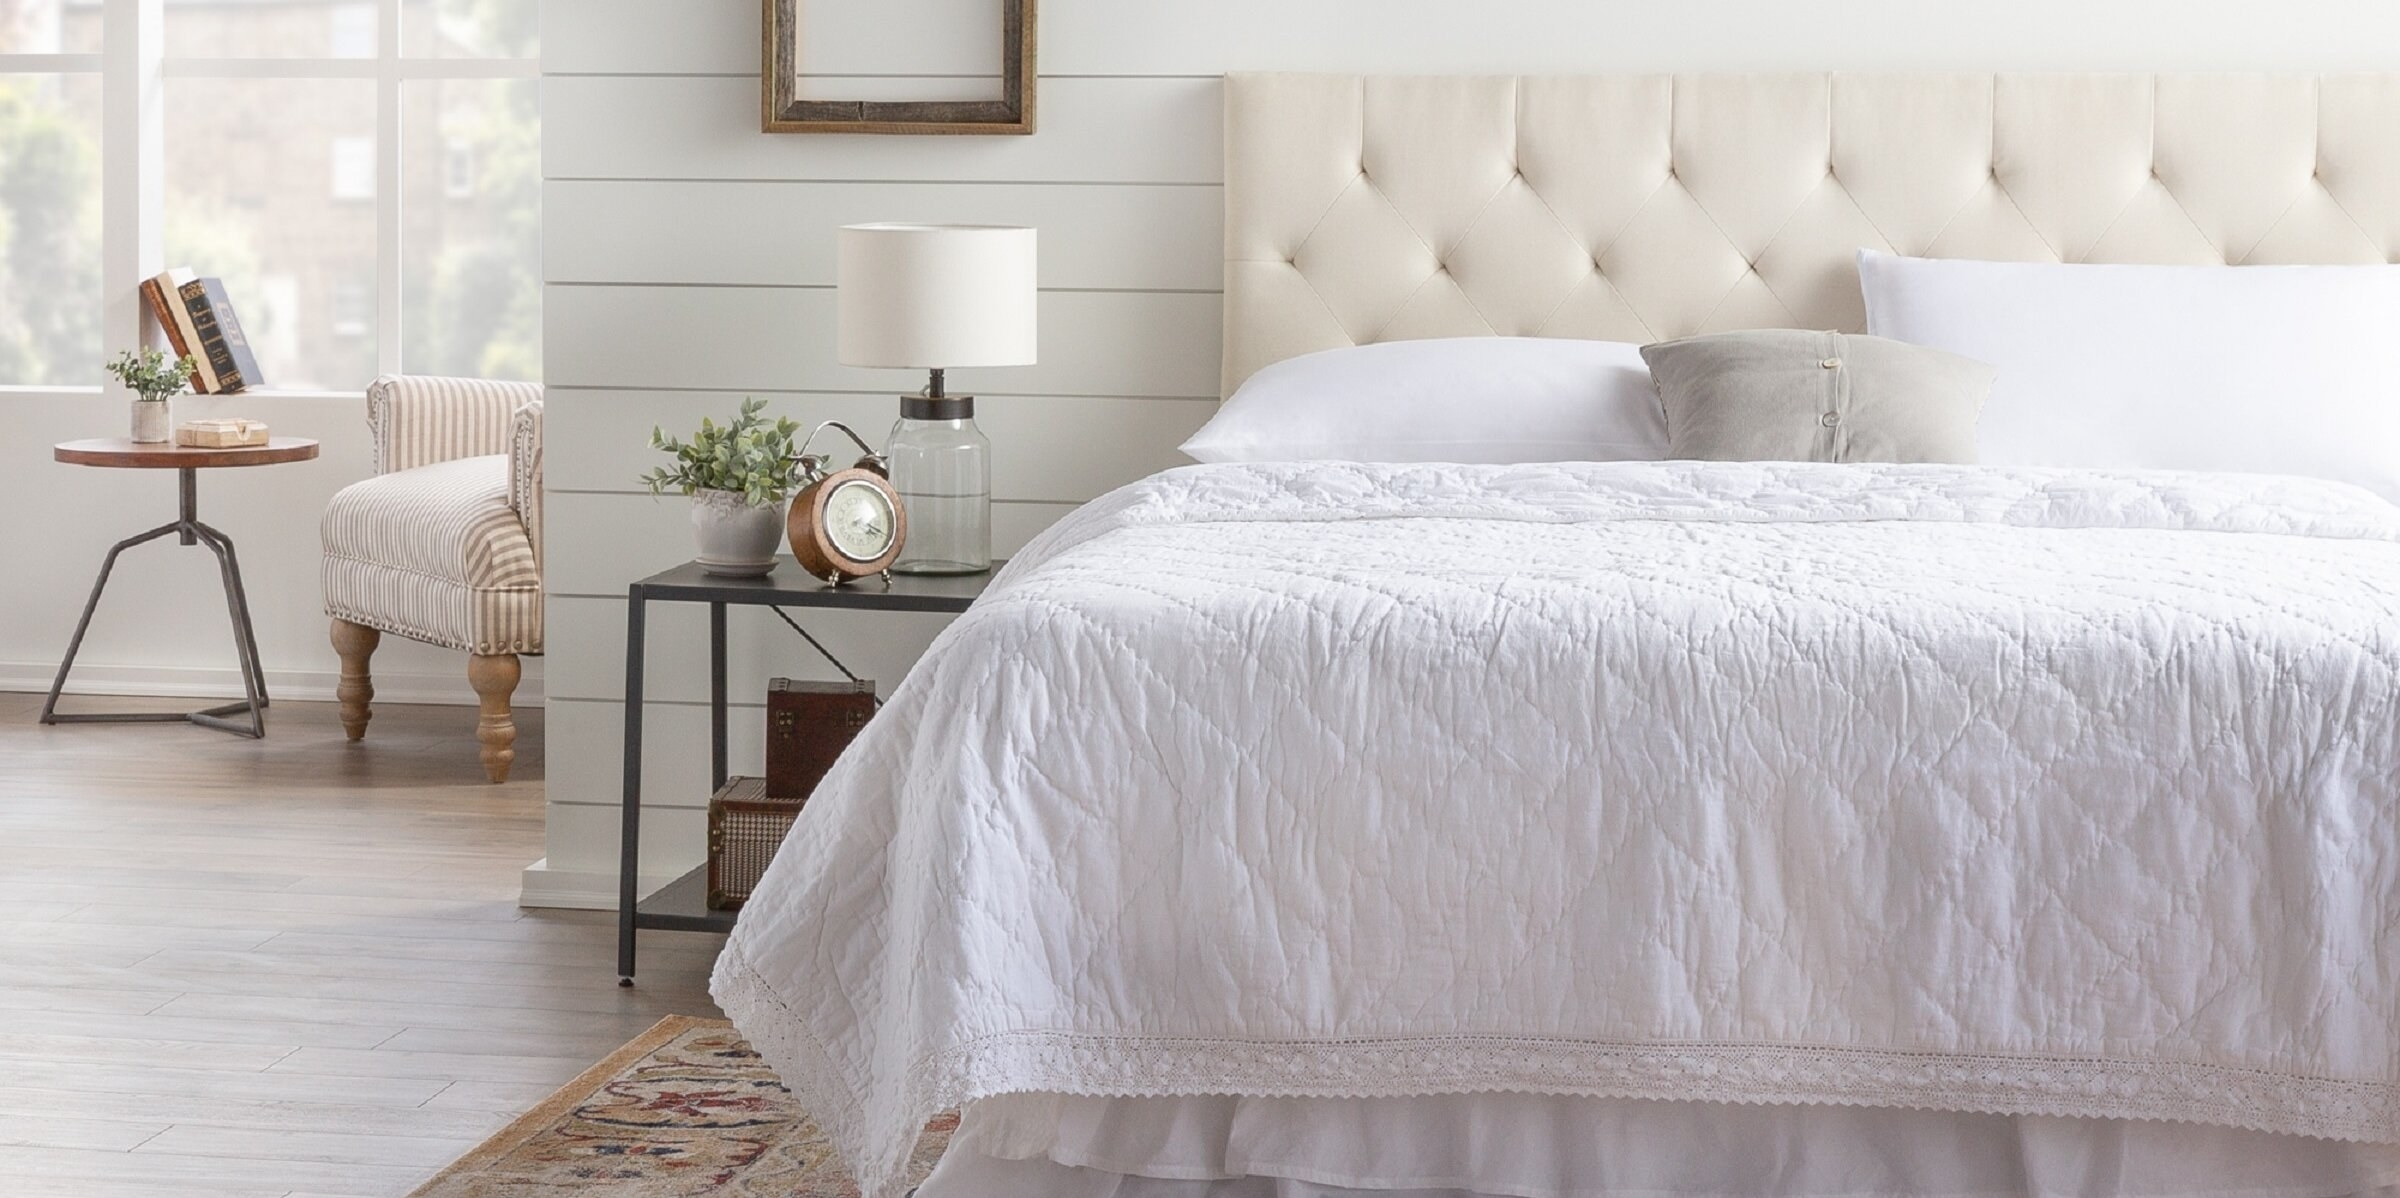 The headboard in a bedroom, in white